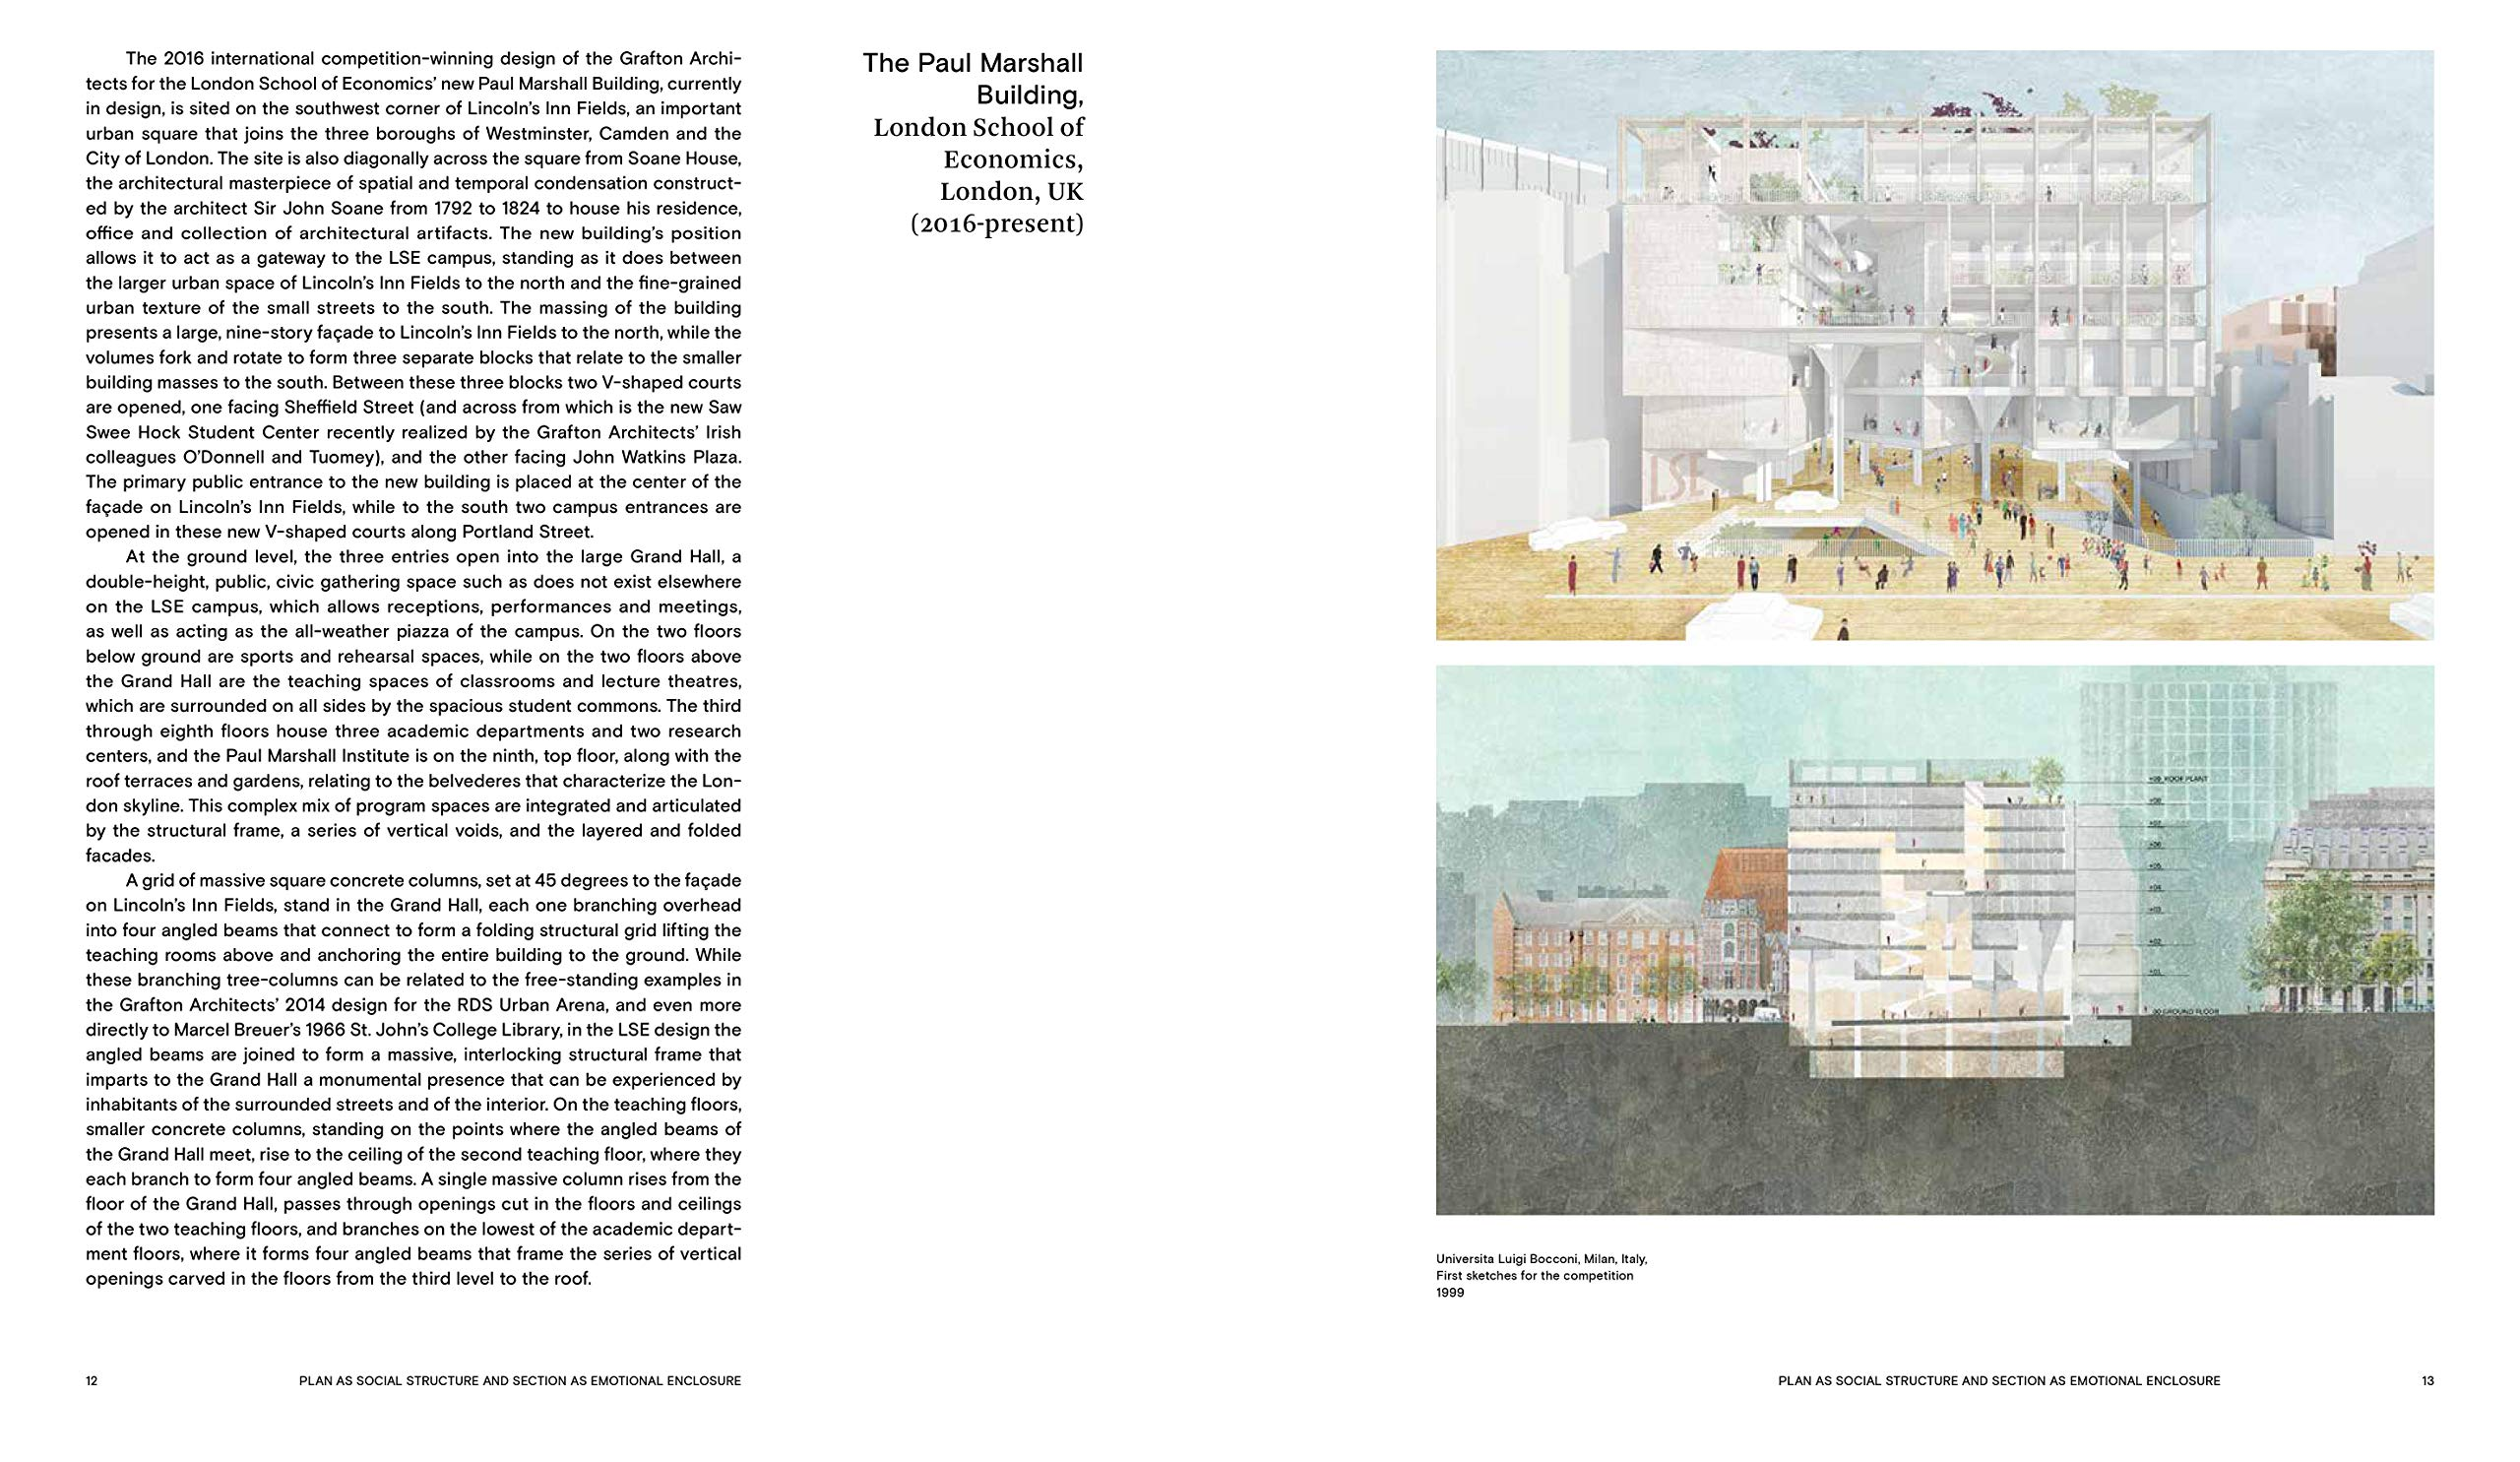 foto de Grafton Architects: McCarter, Robert: 9780714875941: Amazon.com: Books